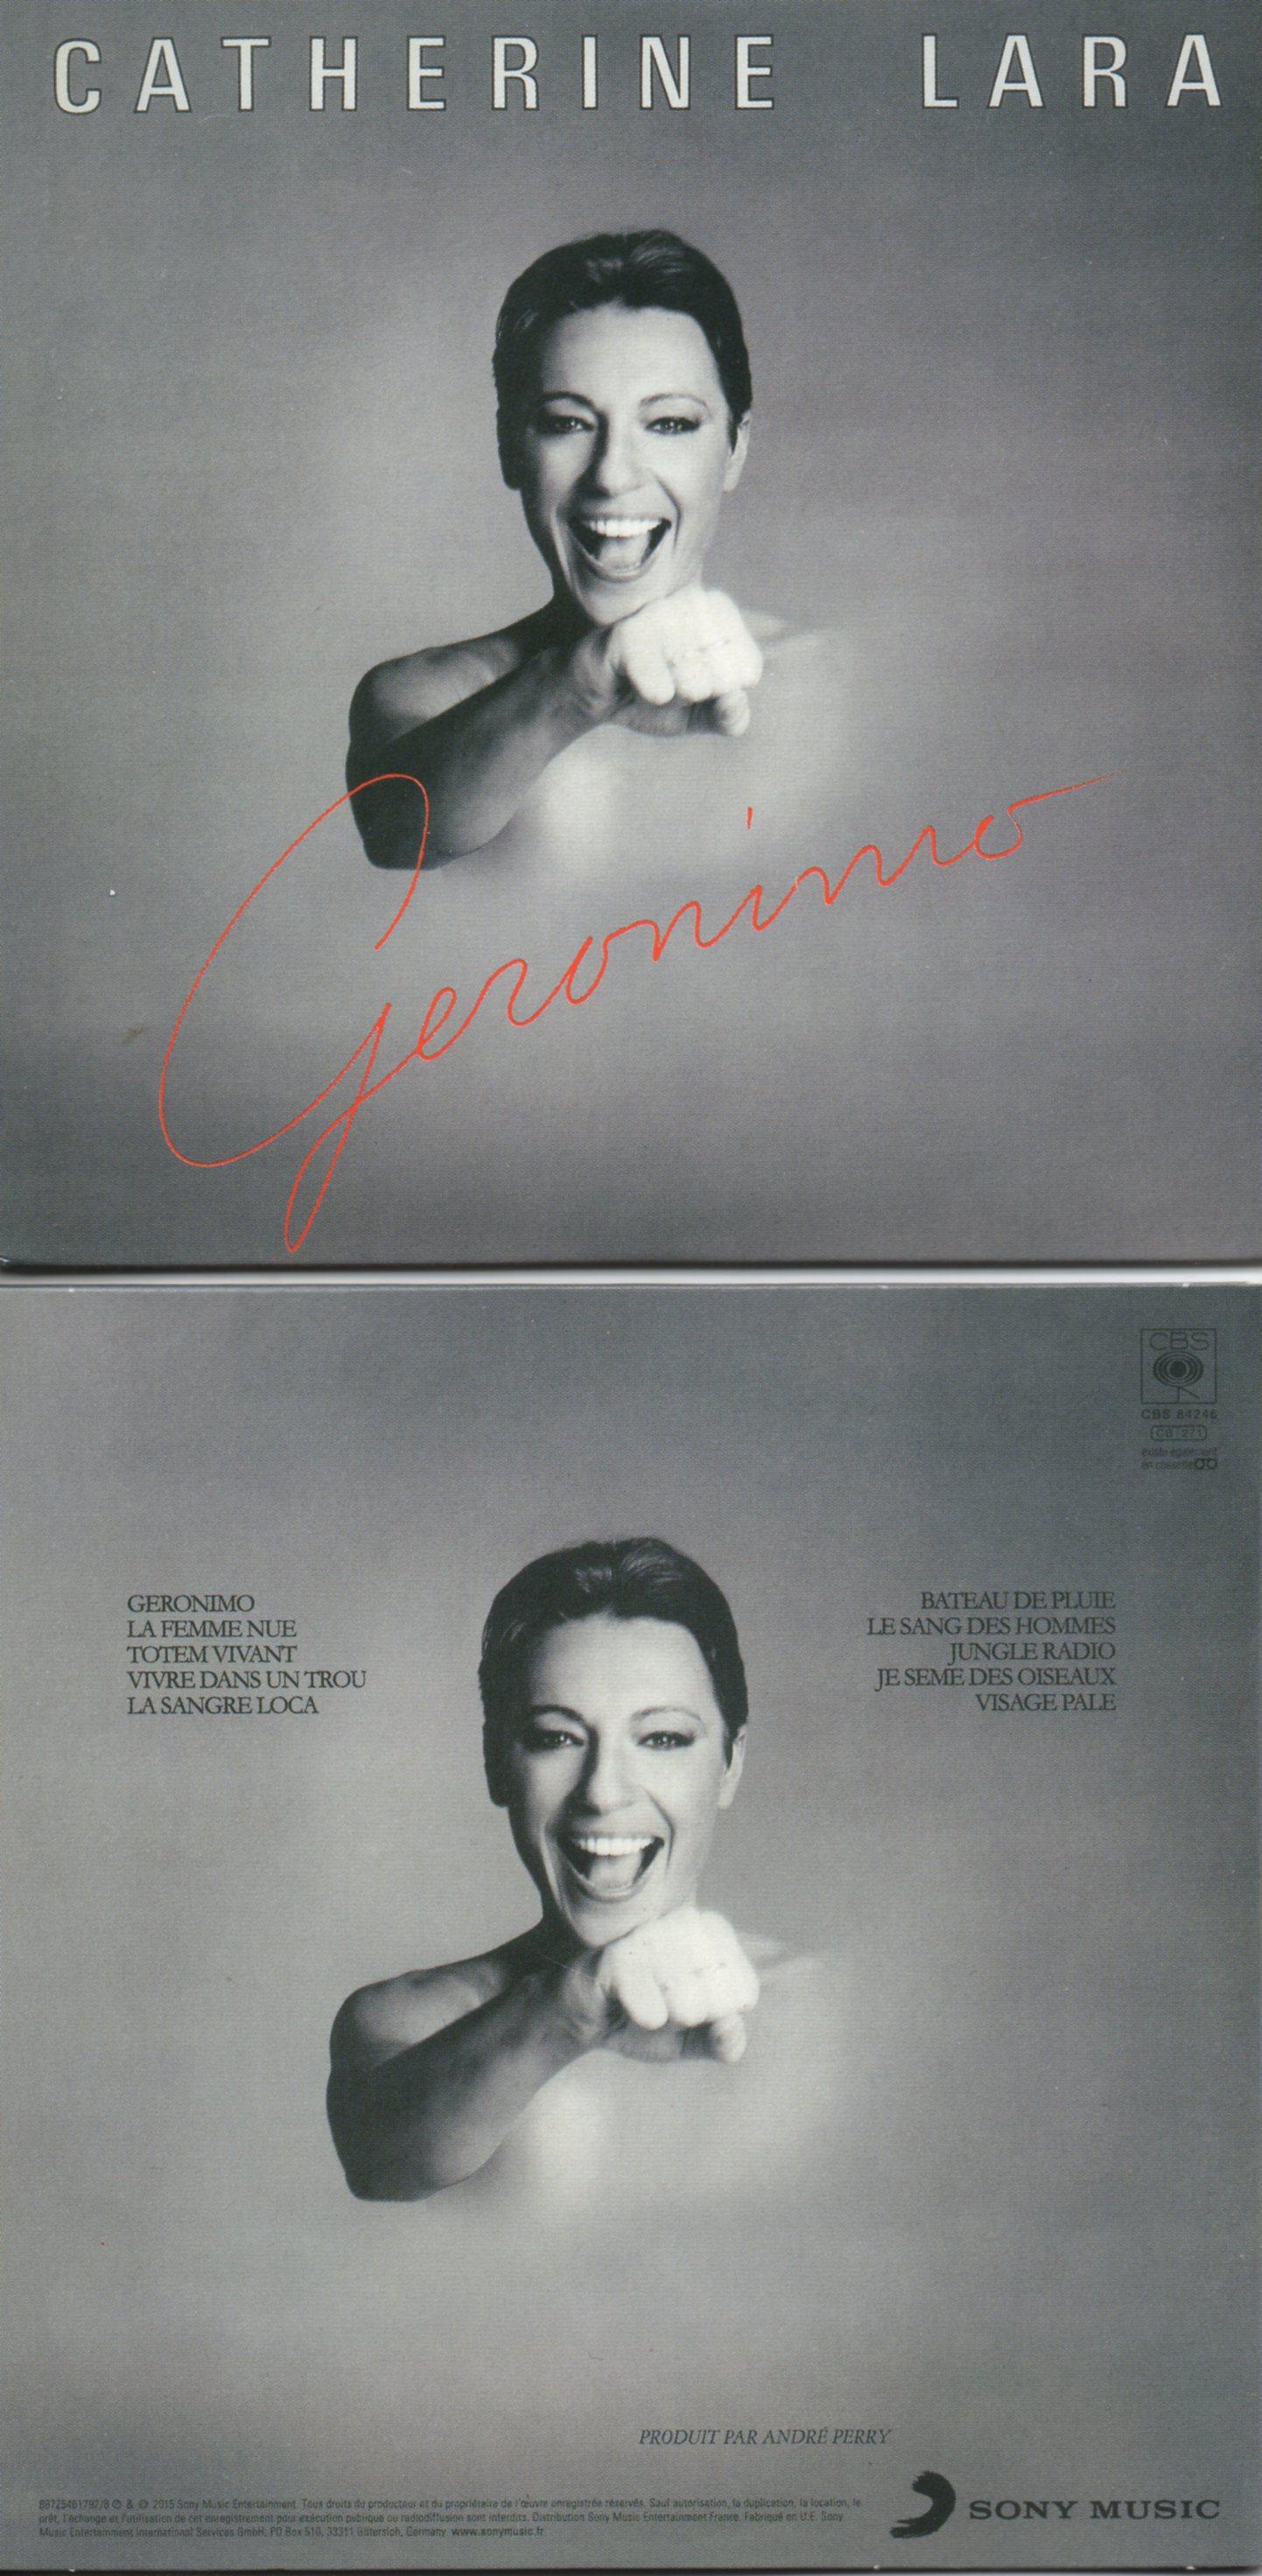 CATHERINE LARA - Geronimo - MINI LP REPLICA - 10-TRACK CARD SLEEVE - Pochette Cartonnée - CD